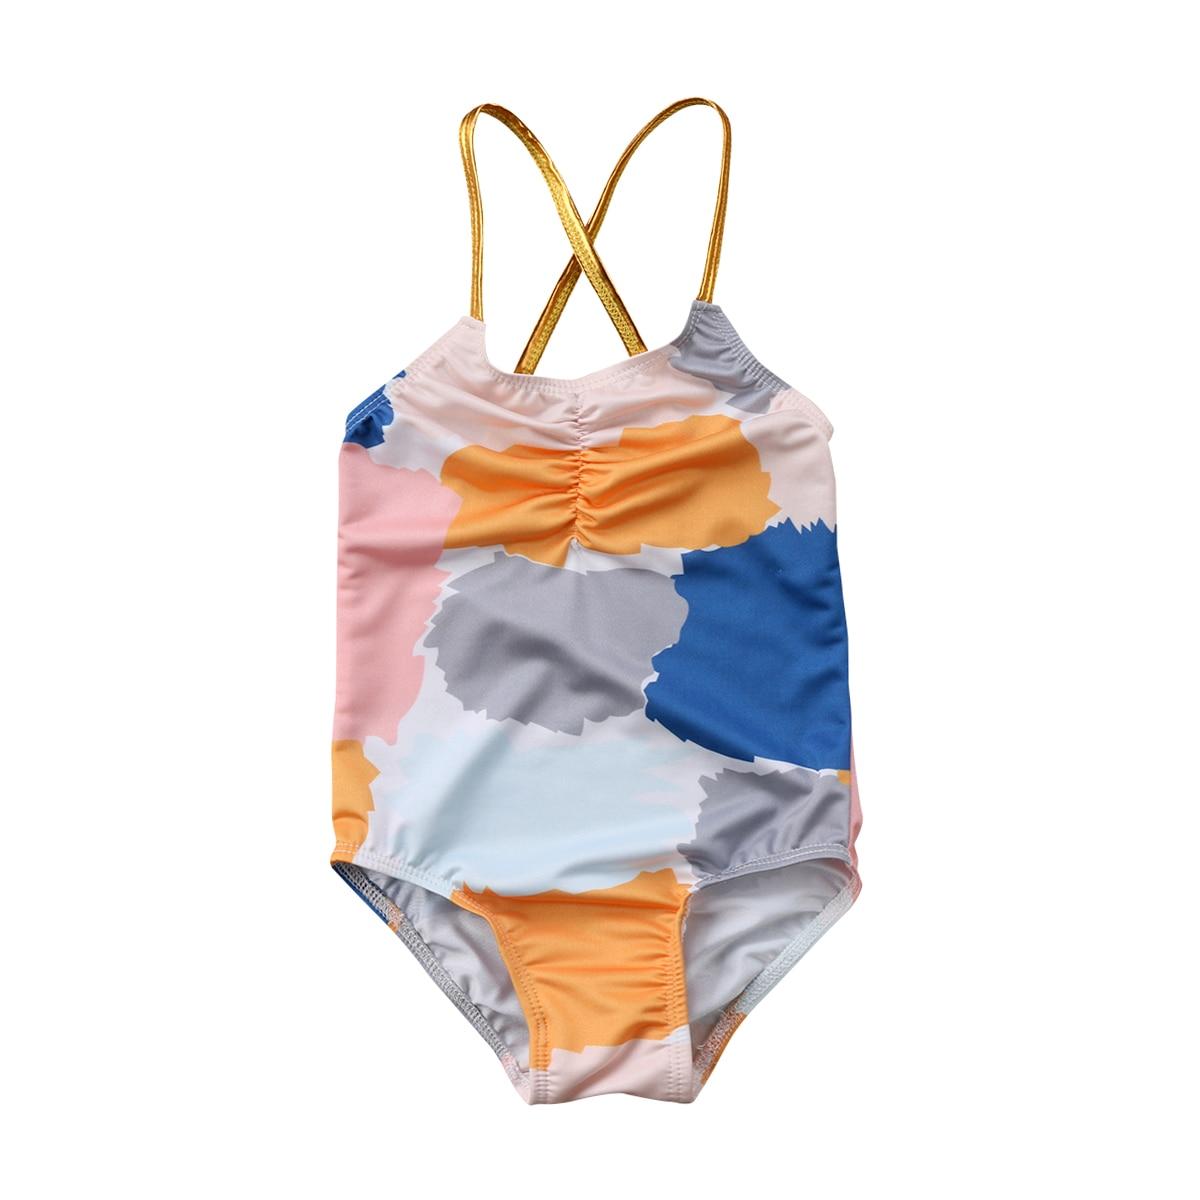 Lovely Newborn Toddled Kid Baby Girls Halter Colorful Swimwear Swimsuit Bathing Suit One-Piece Bikini Beach 2018 Summer New